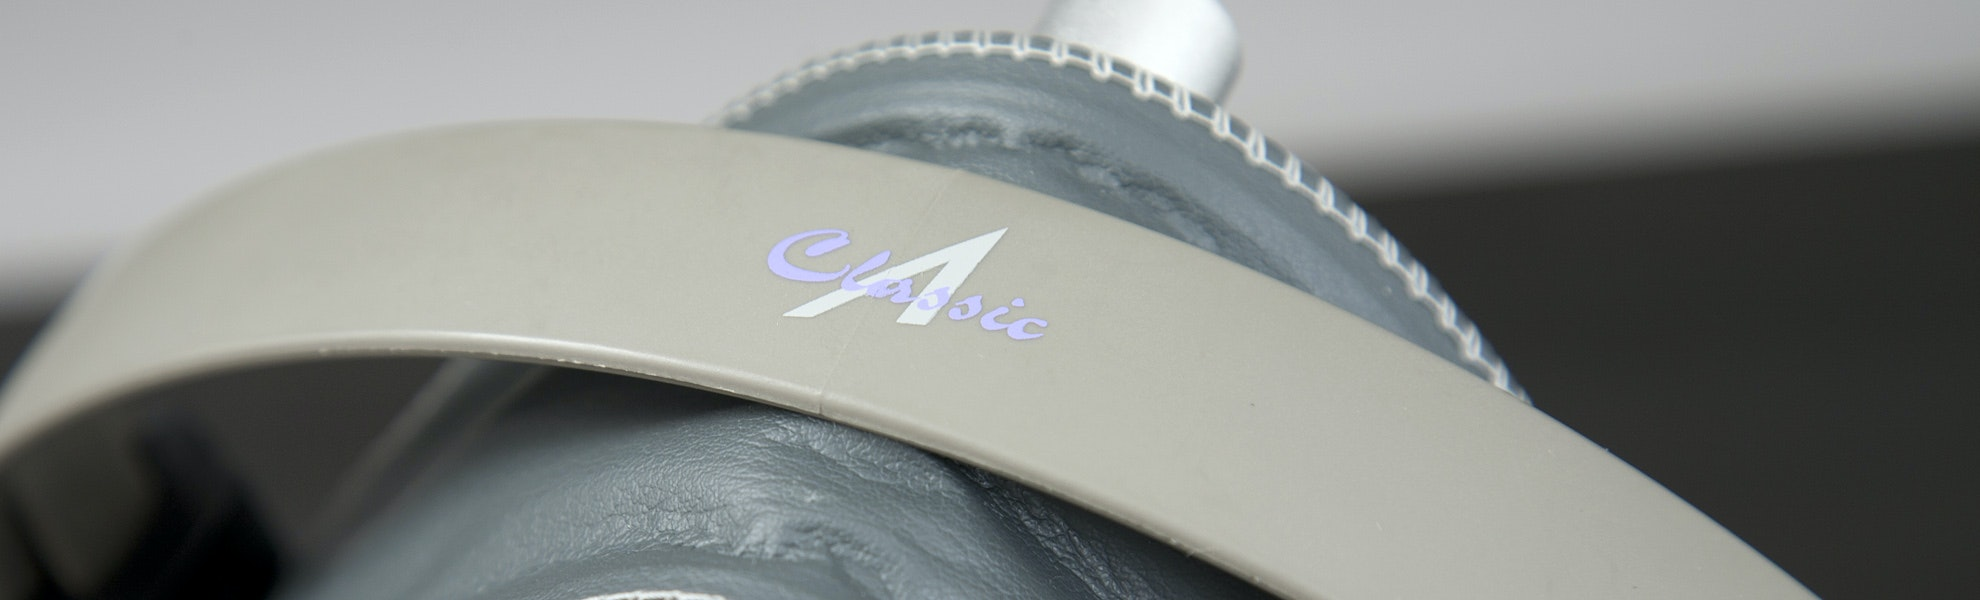 STAX SRS-3170 Electrostatic Earspeaker System